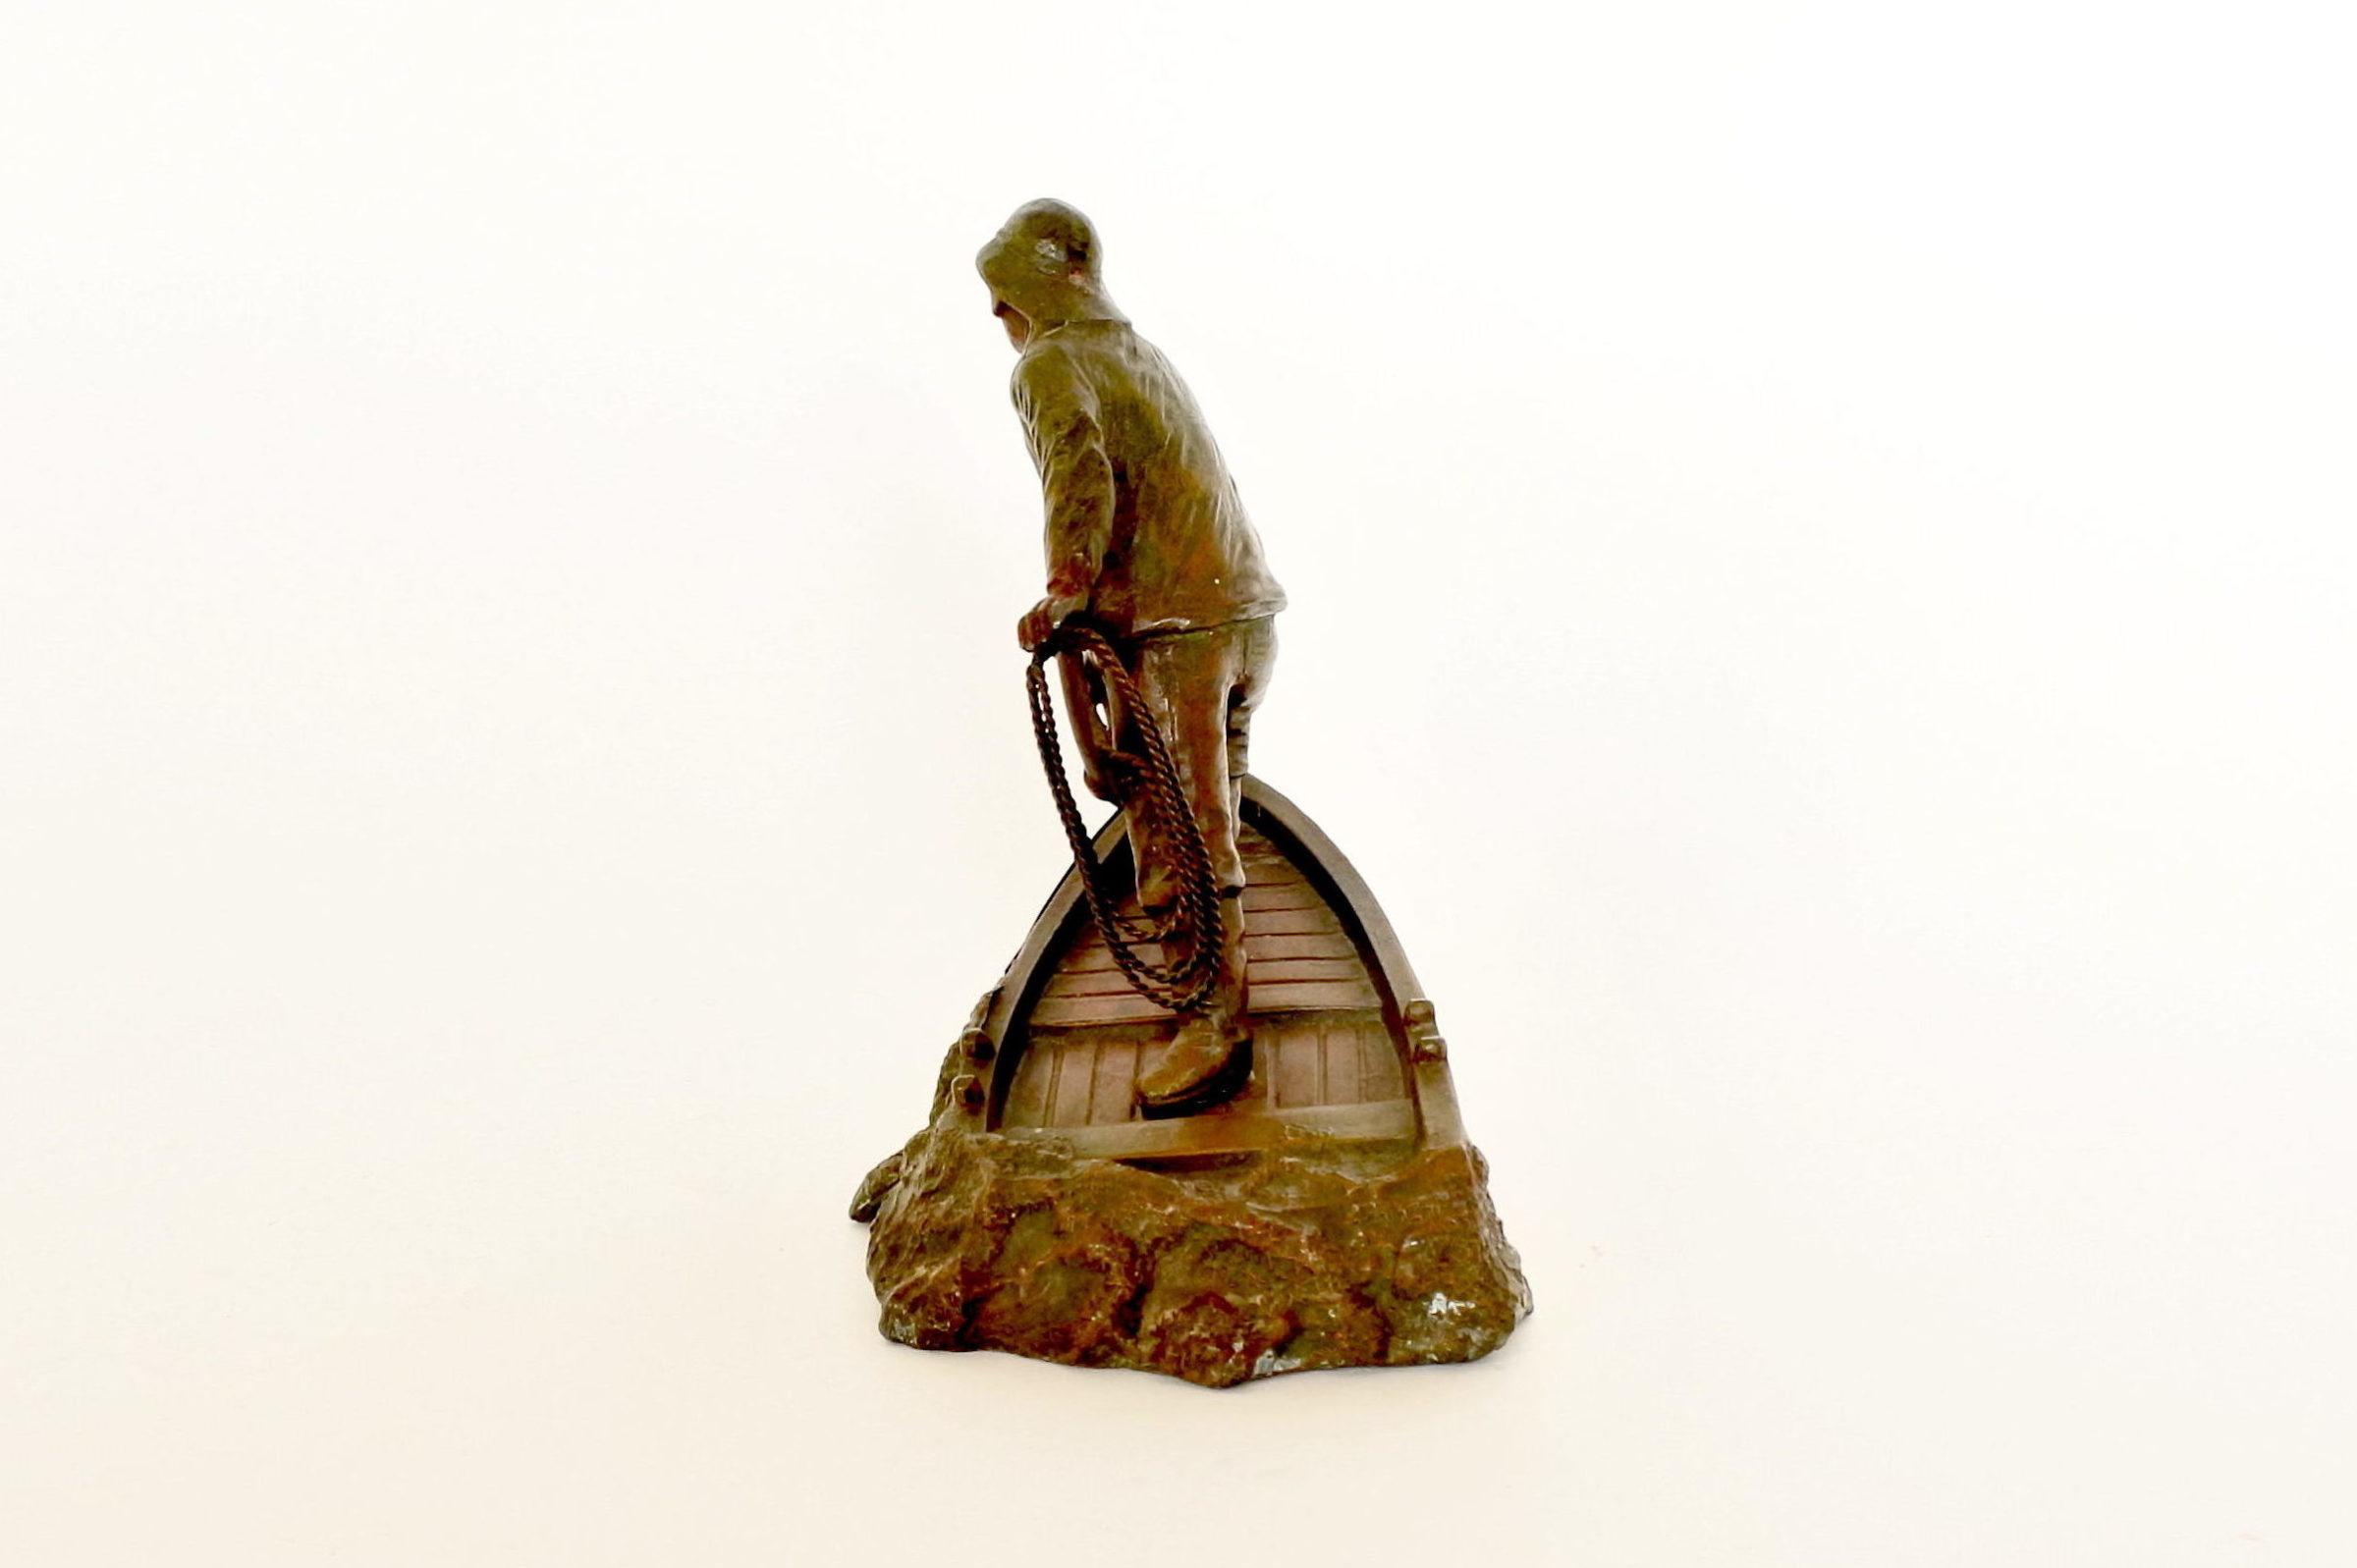 Statuina in bronzo patinato con marinaio - A.Ouvet - 2